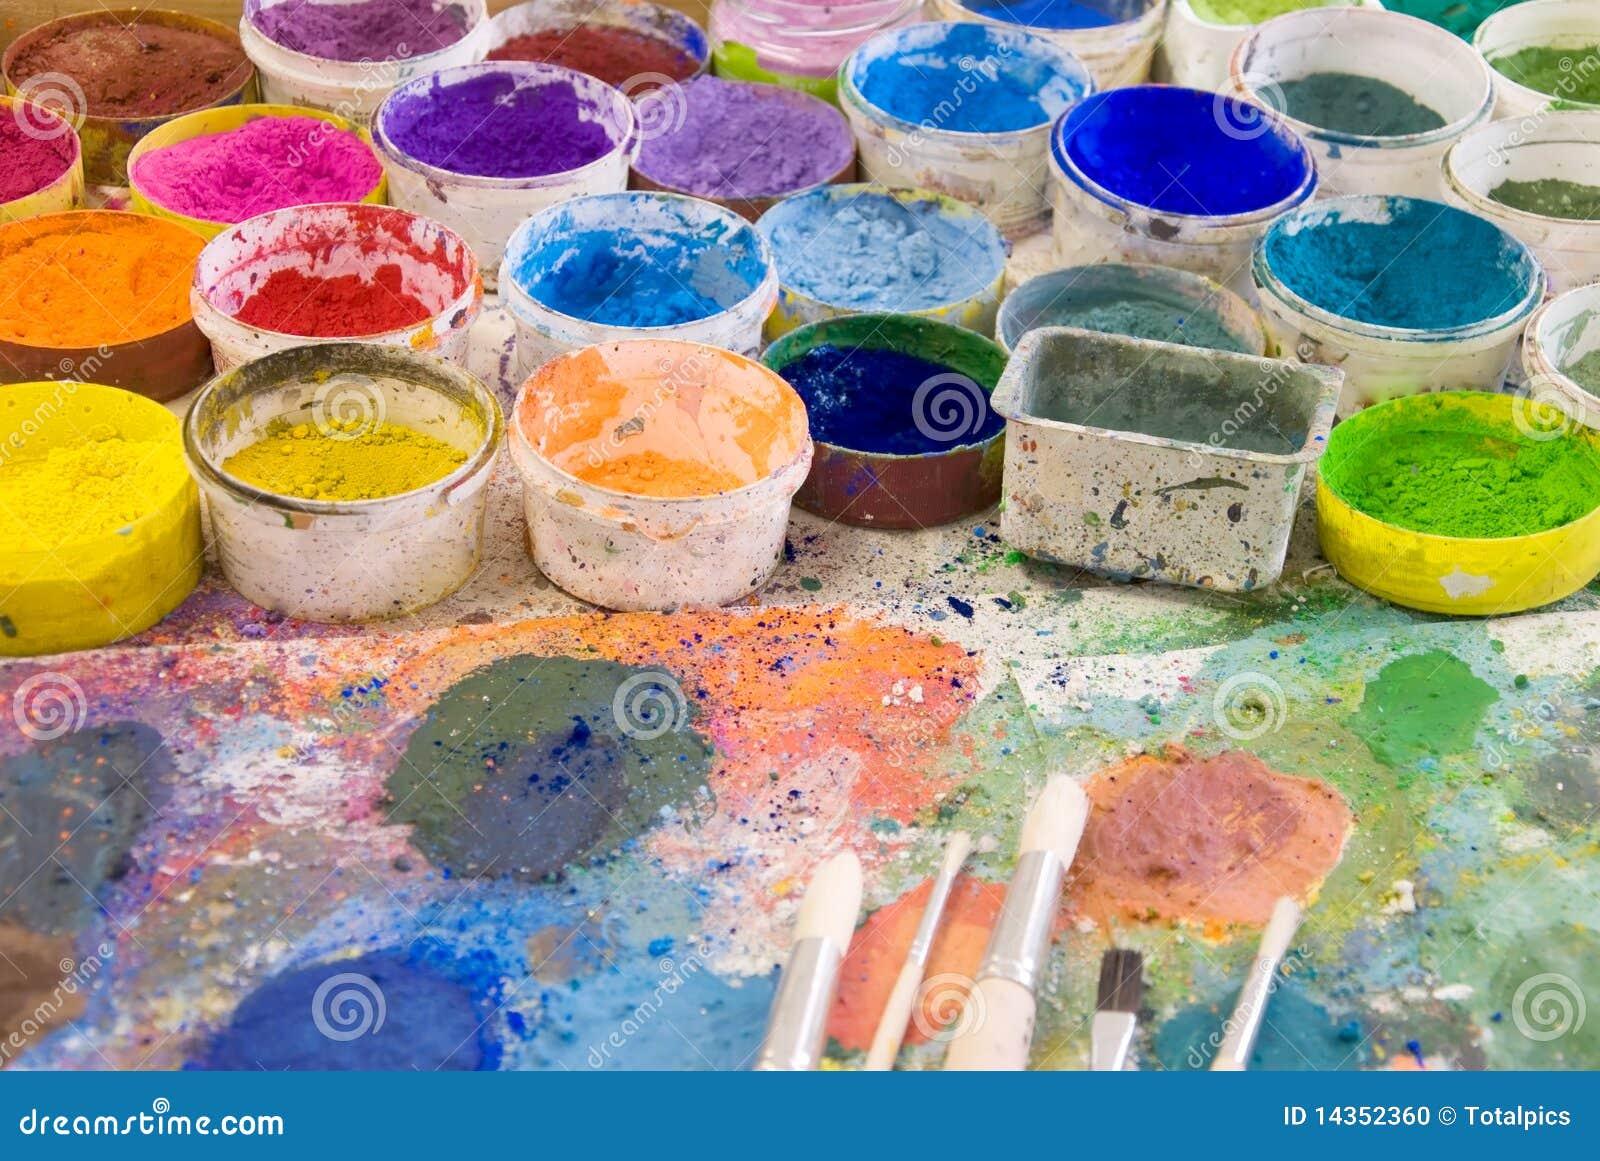 pigmentfarben stockfoto bild 14352360. Black Bedroom Furniture Sets. Home Design Ideas